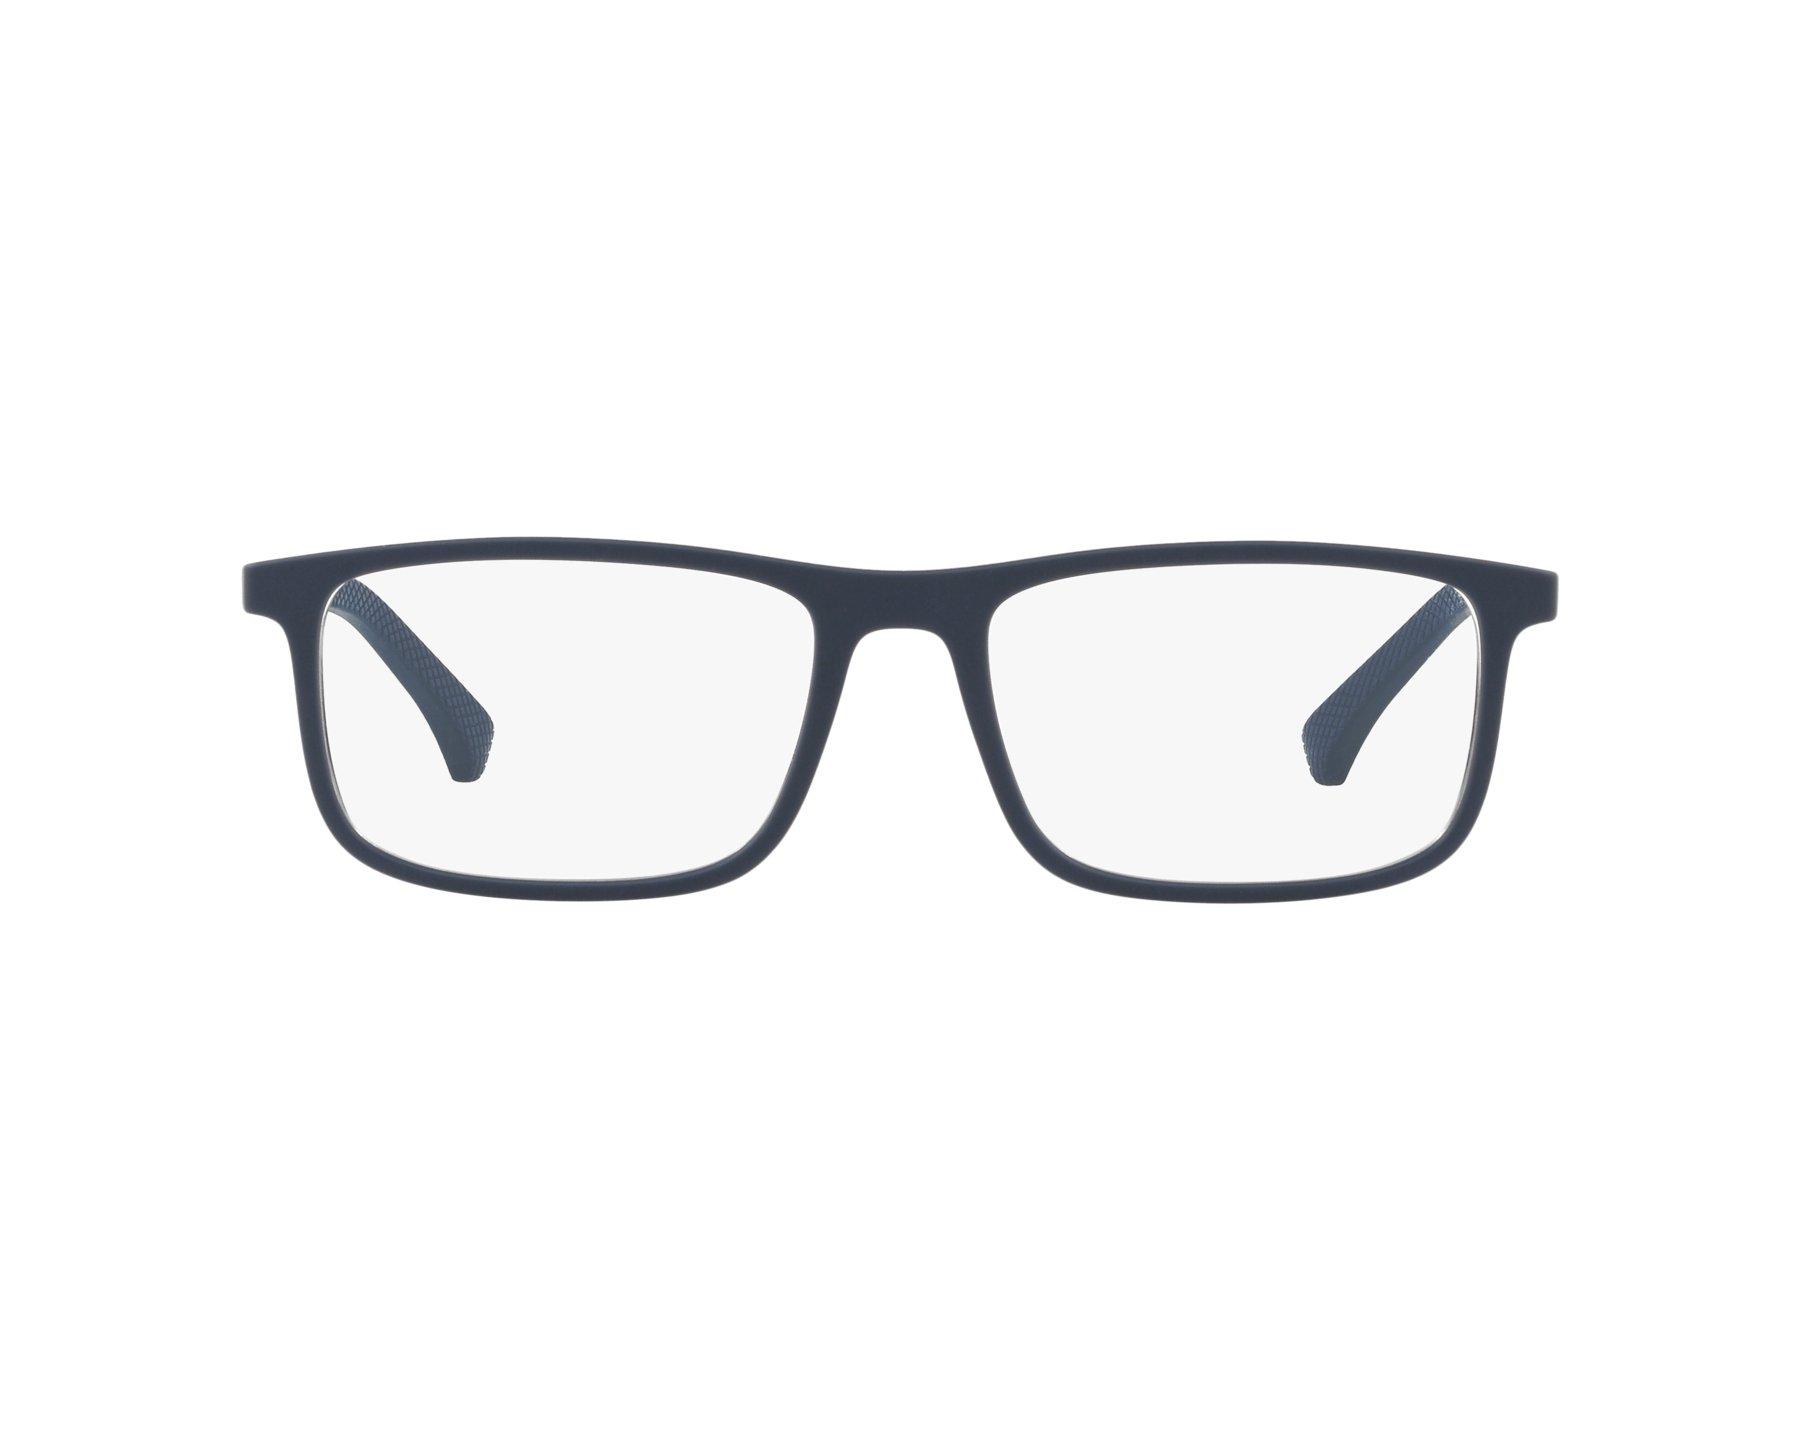 Emporio Armani Eyeglasses EA-3125 5474 Blue | visio-net.com